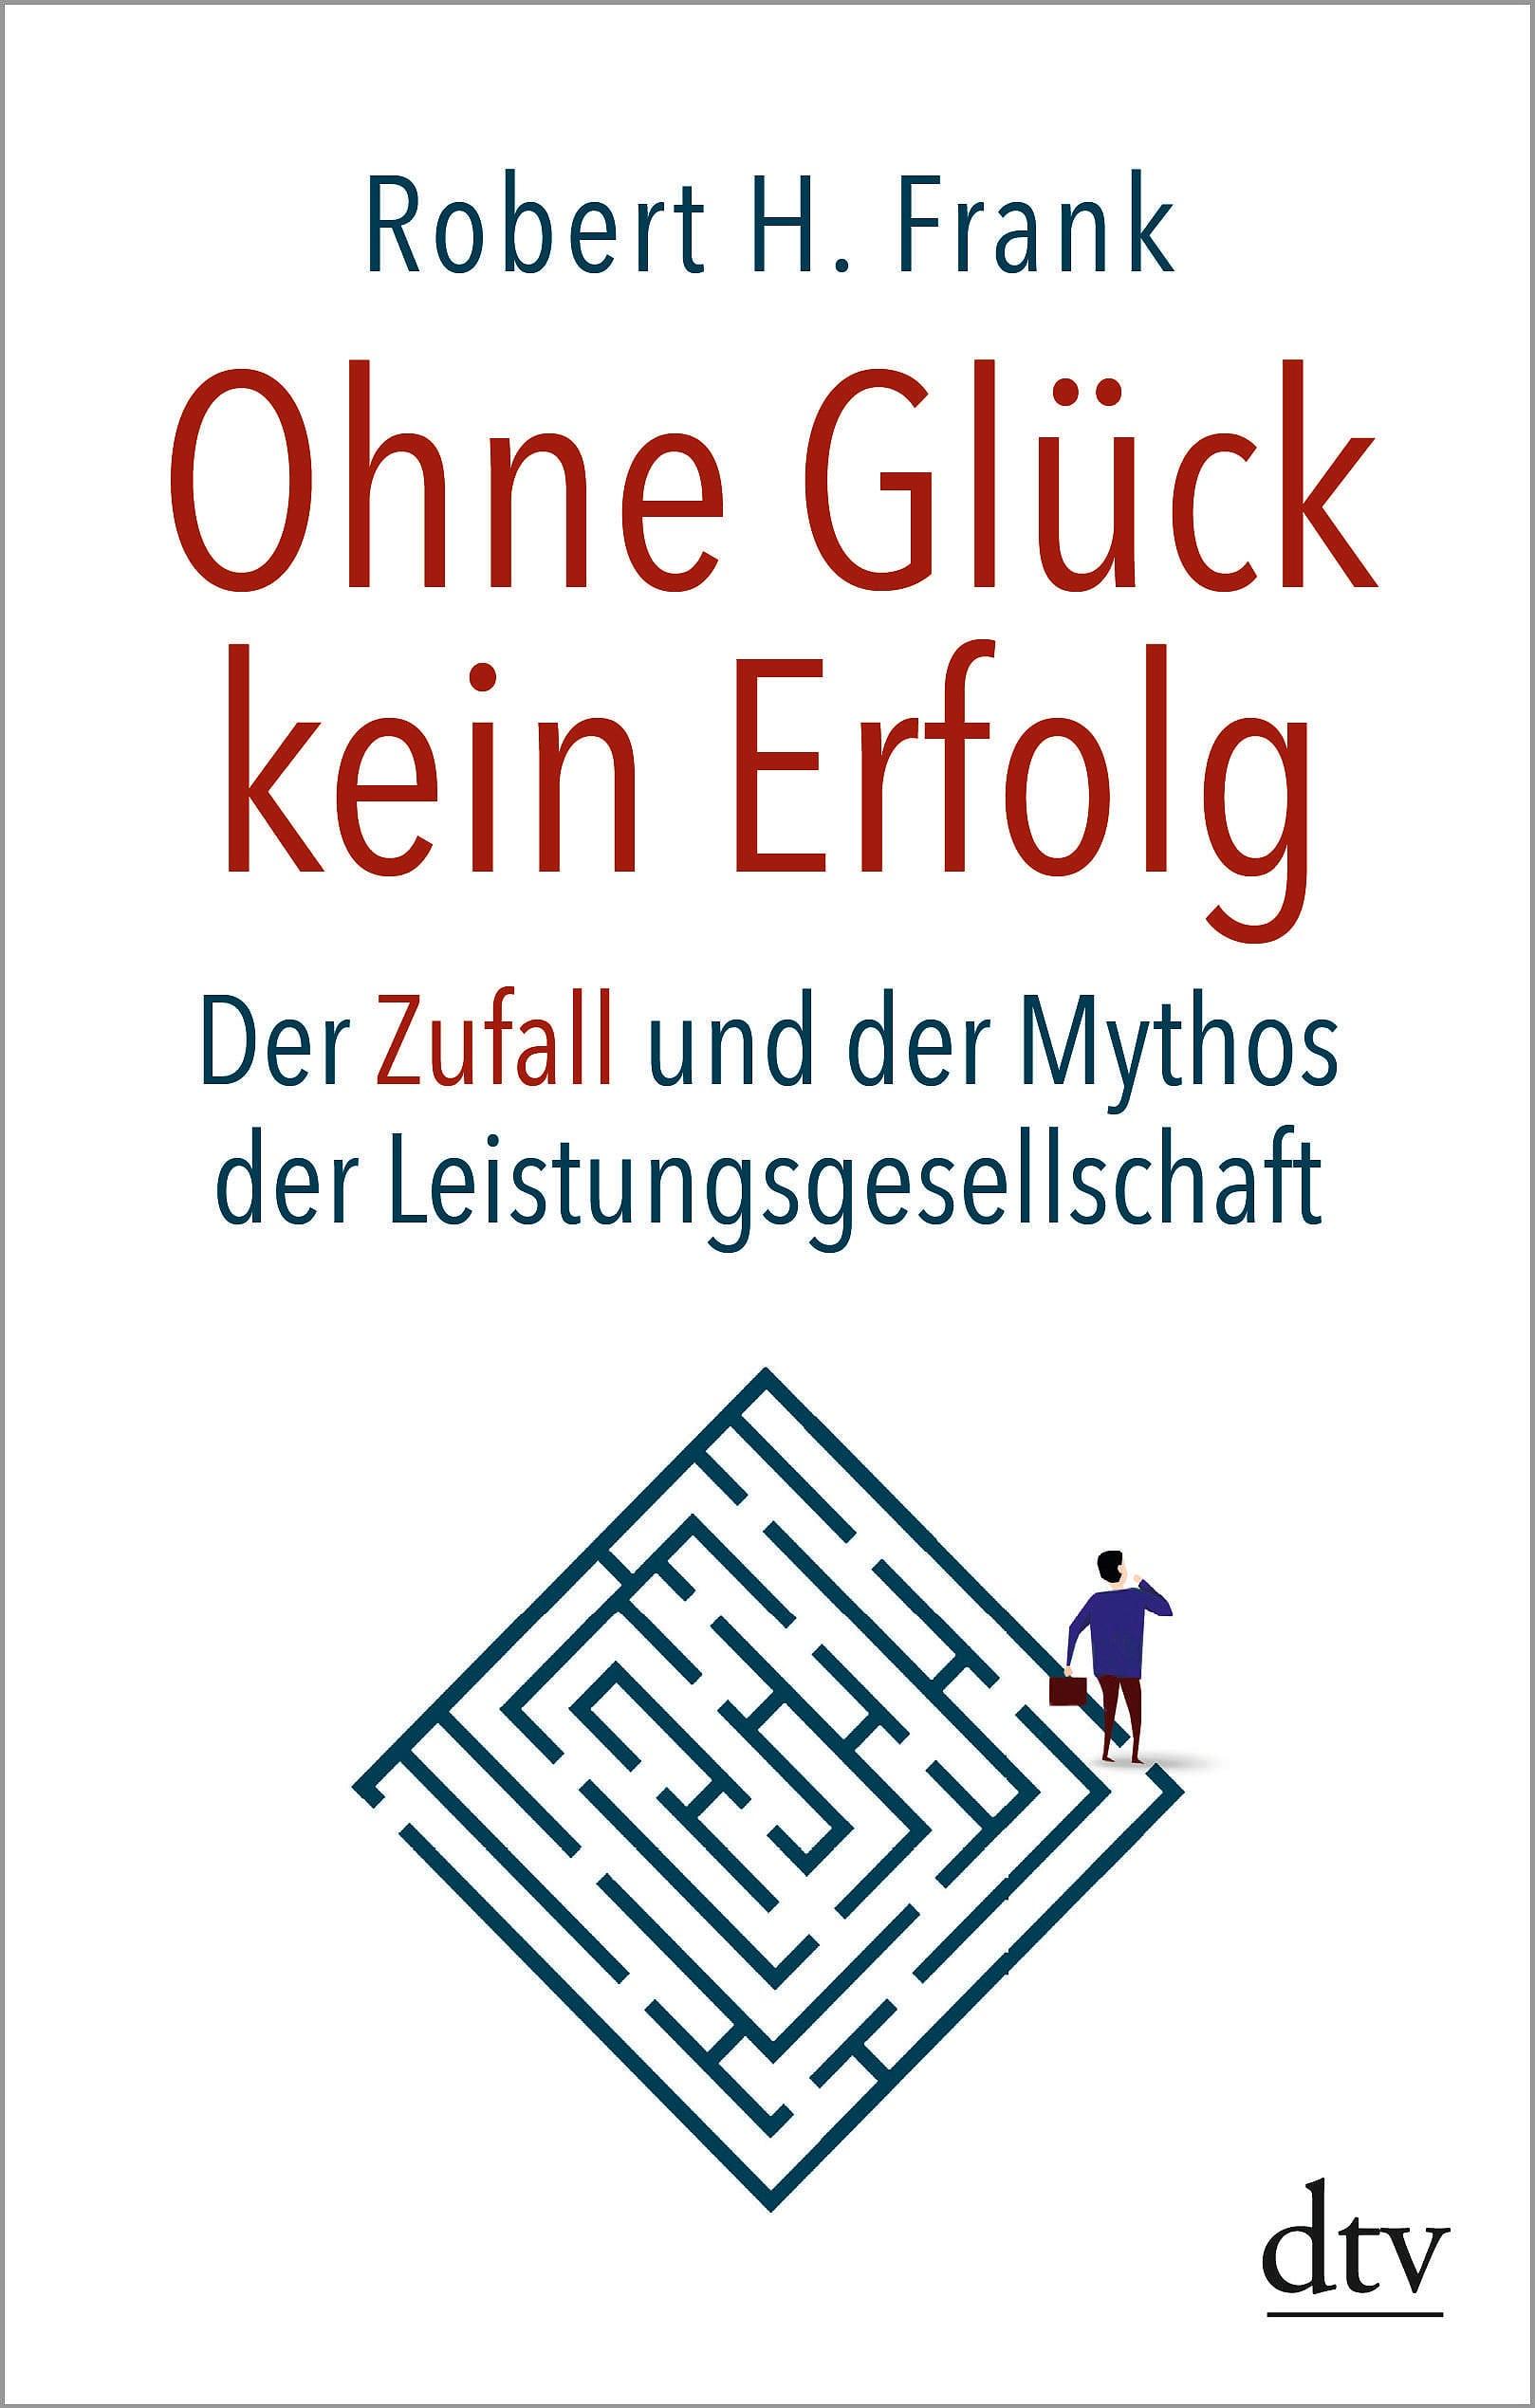 Berühmt Google Lebenslauf Buchrückblick Ideen - Entry Level Resume ...